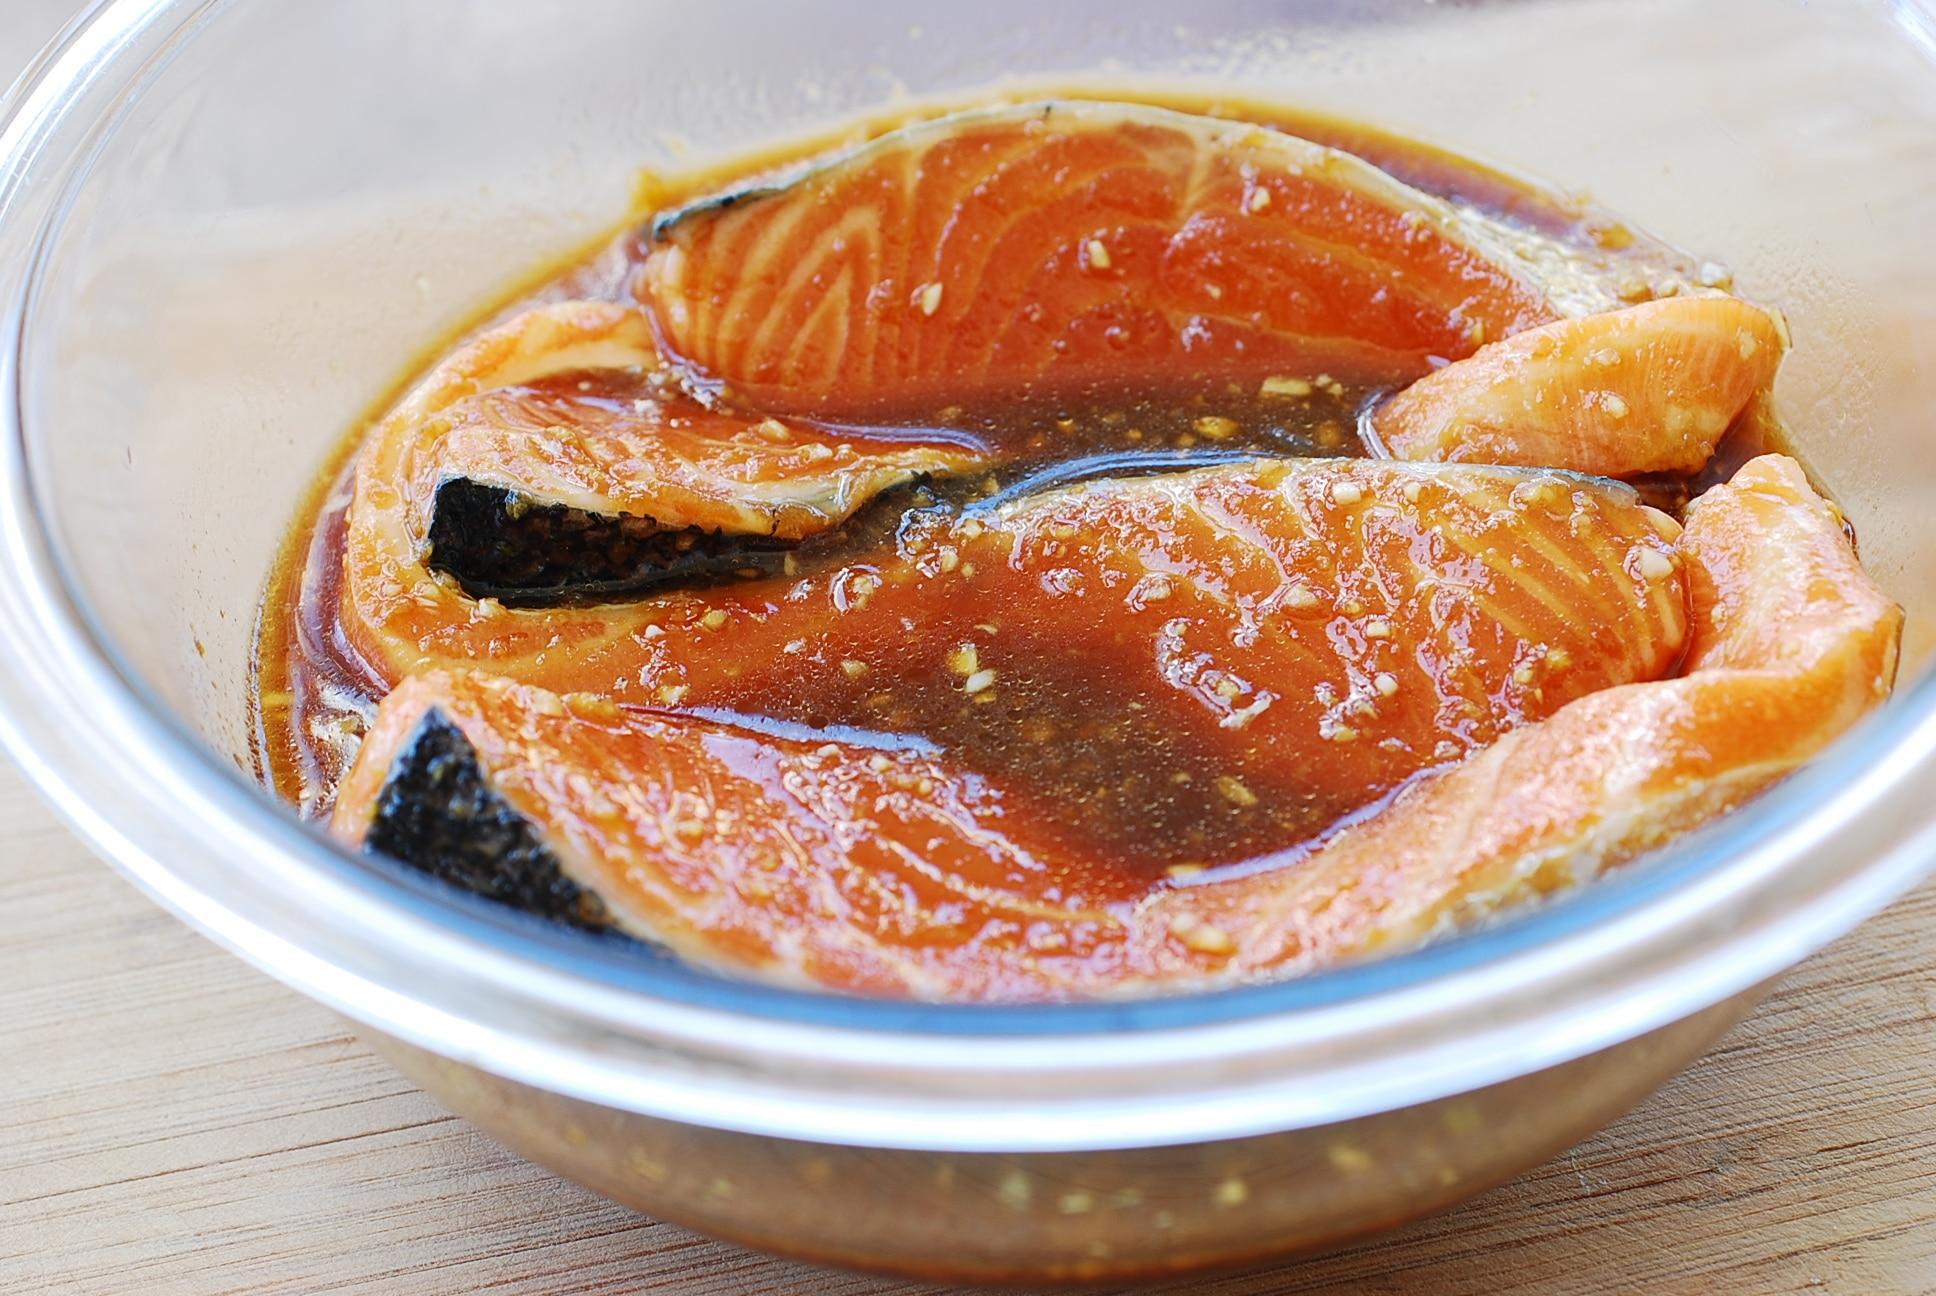 Salmon marinated in bulgogi sauce